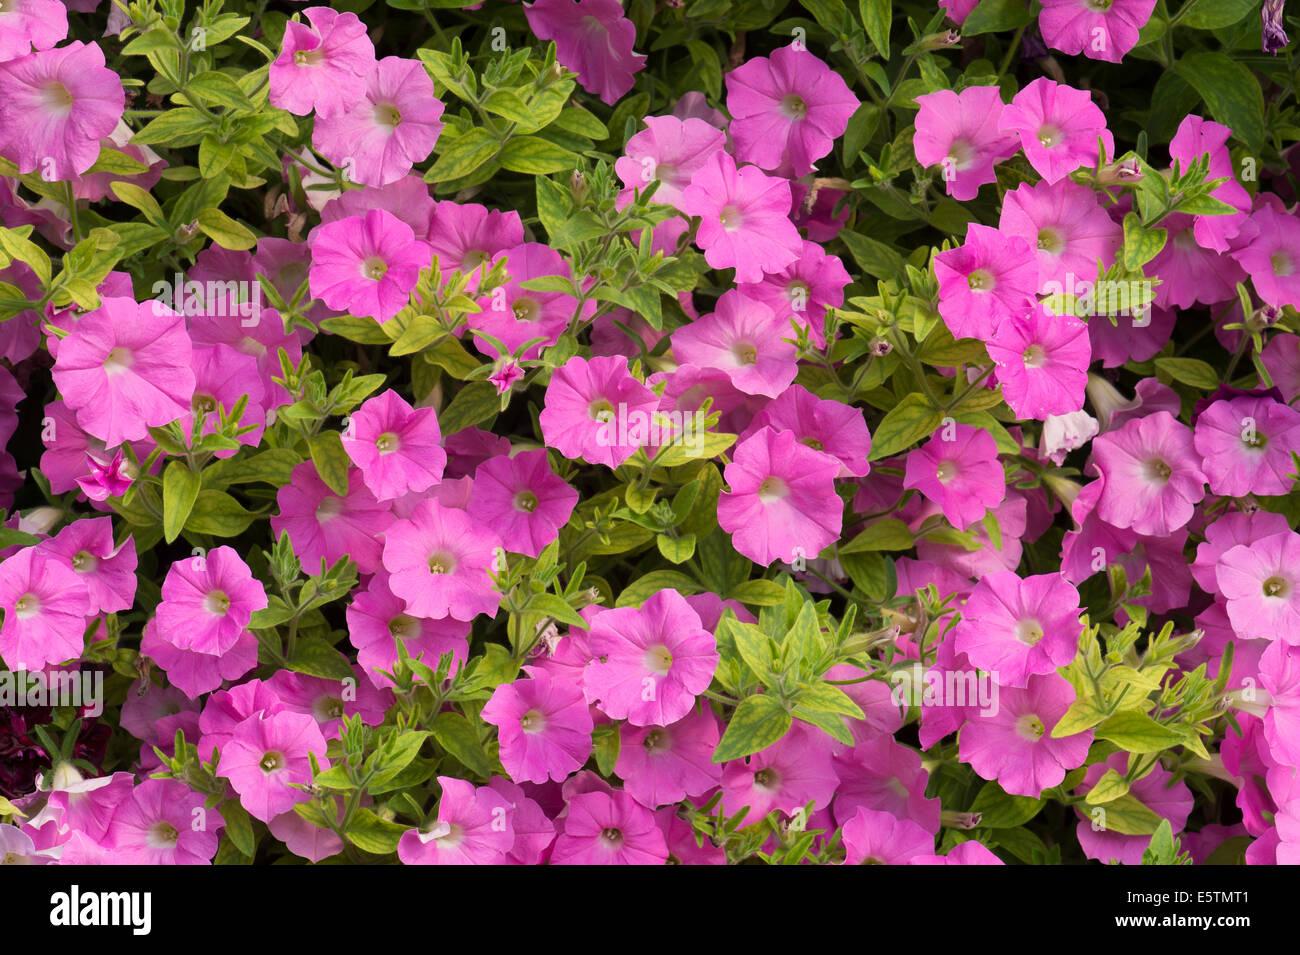 Petunia X hybrida Shock Wave Pink Shade. Spreading Petunia flowers - Stock Image